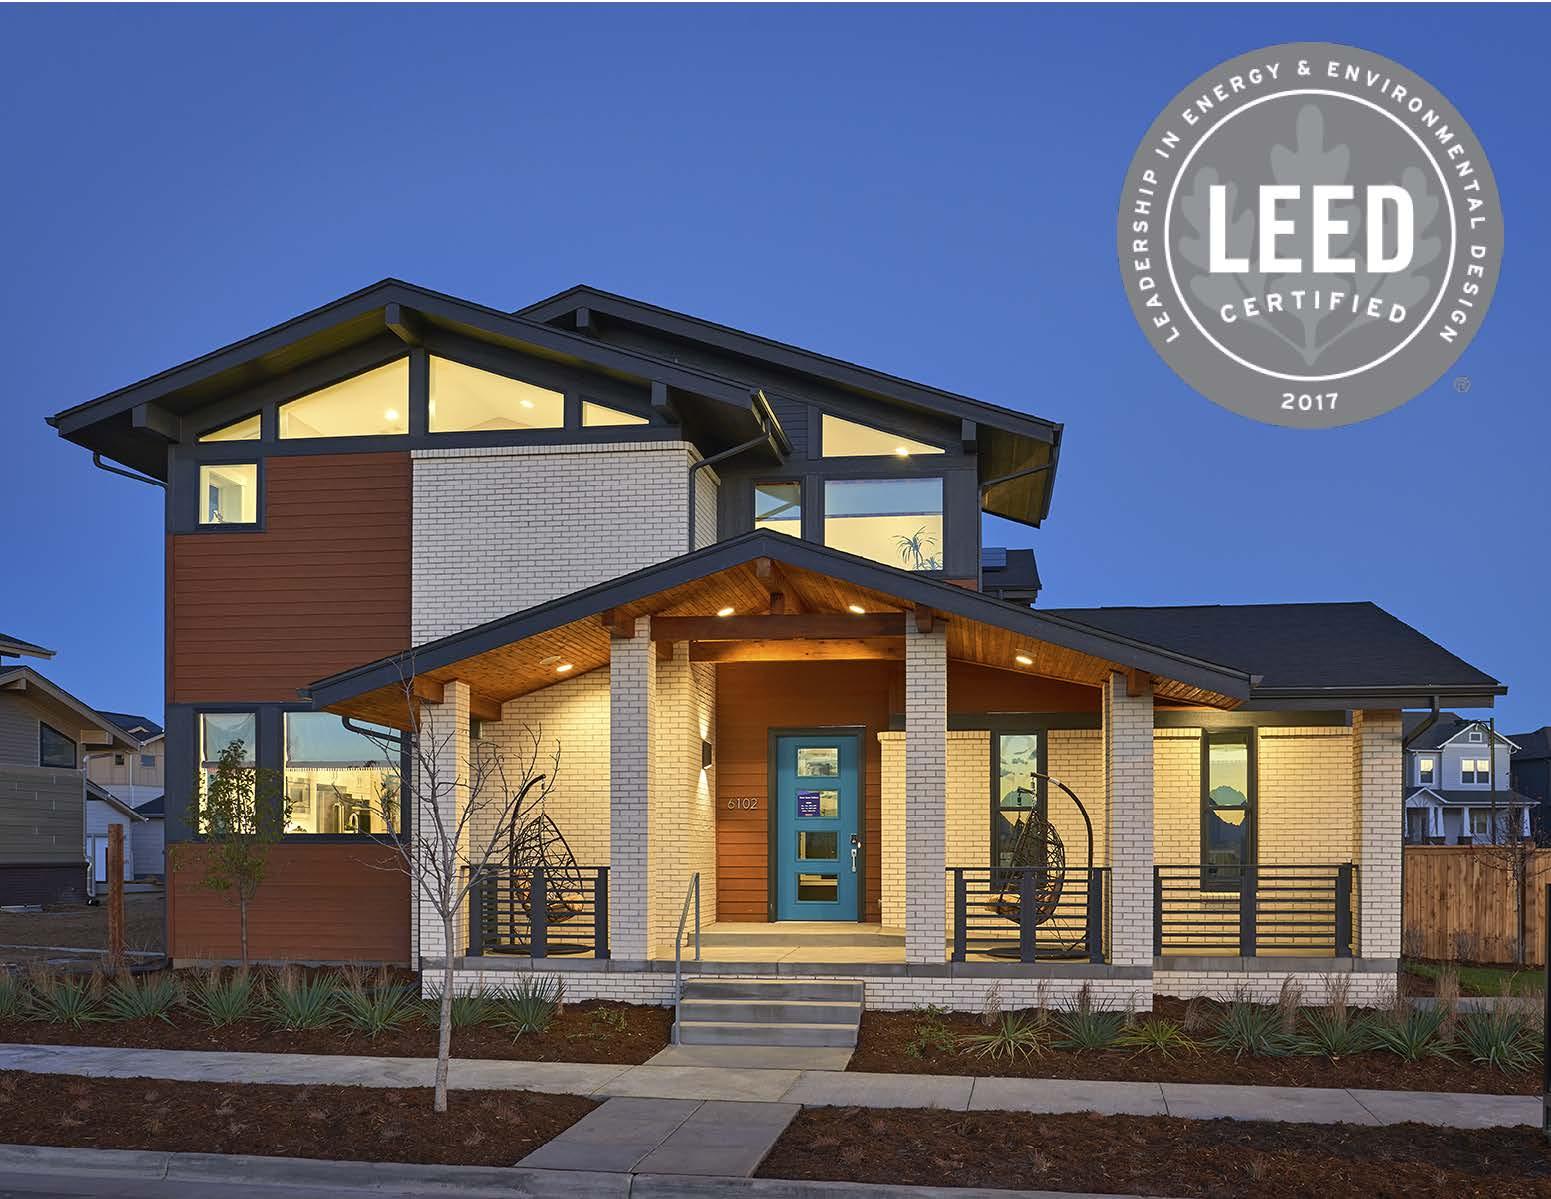 Panacea By Thrive Home Builders Combines Luxury With Zero Energy Denver S 80238